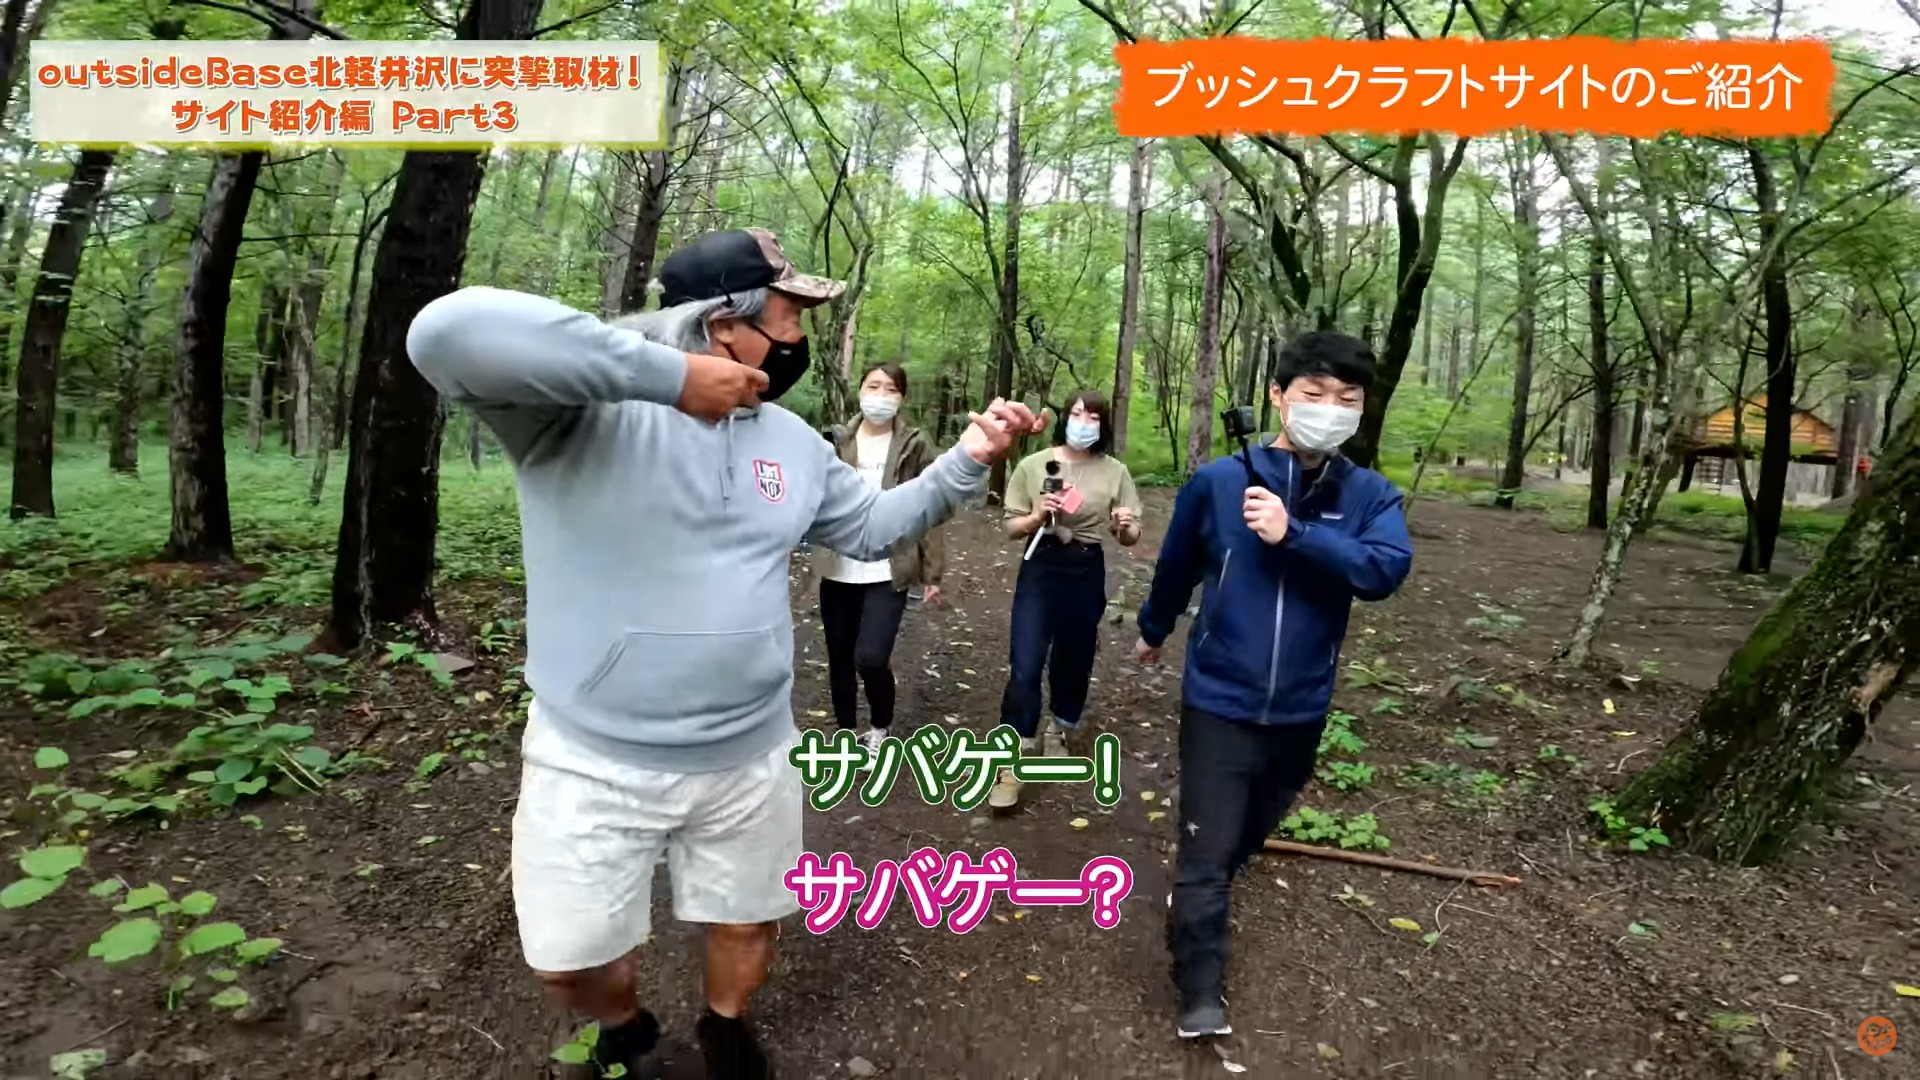 【outsidebase北軽井沢】ブッシュクラフトサイト